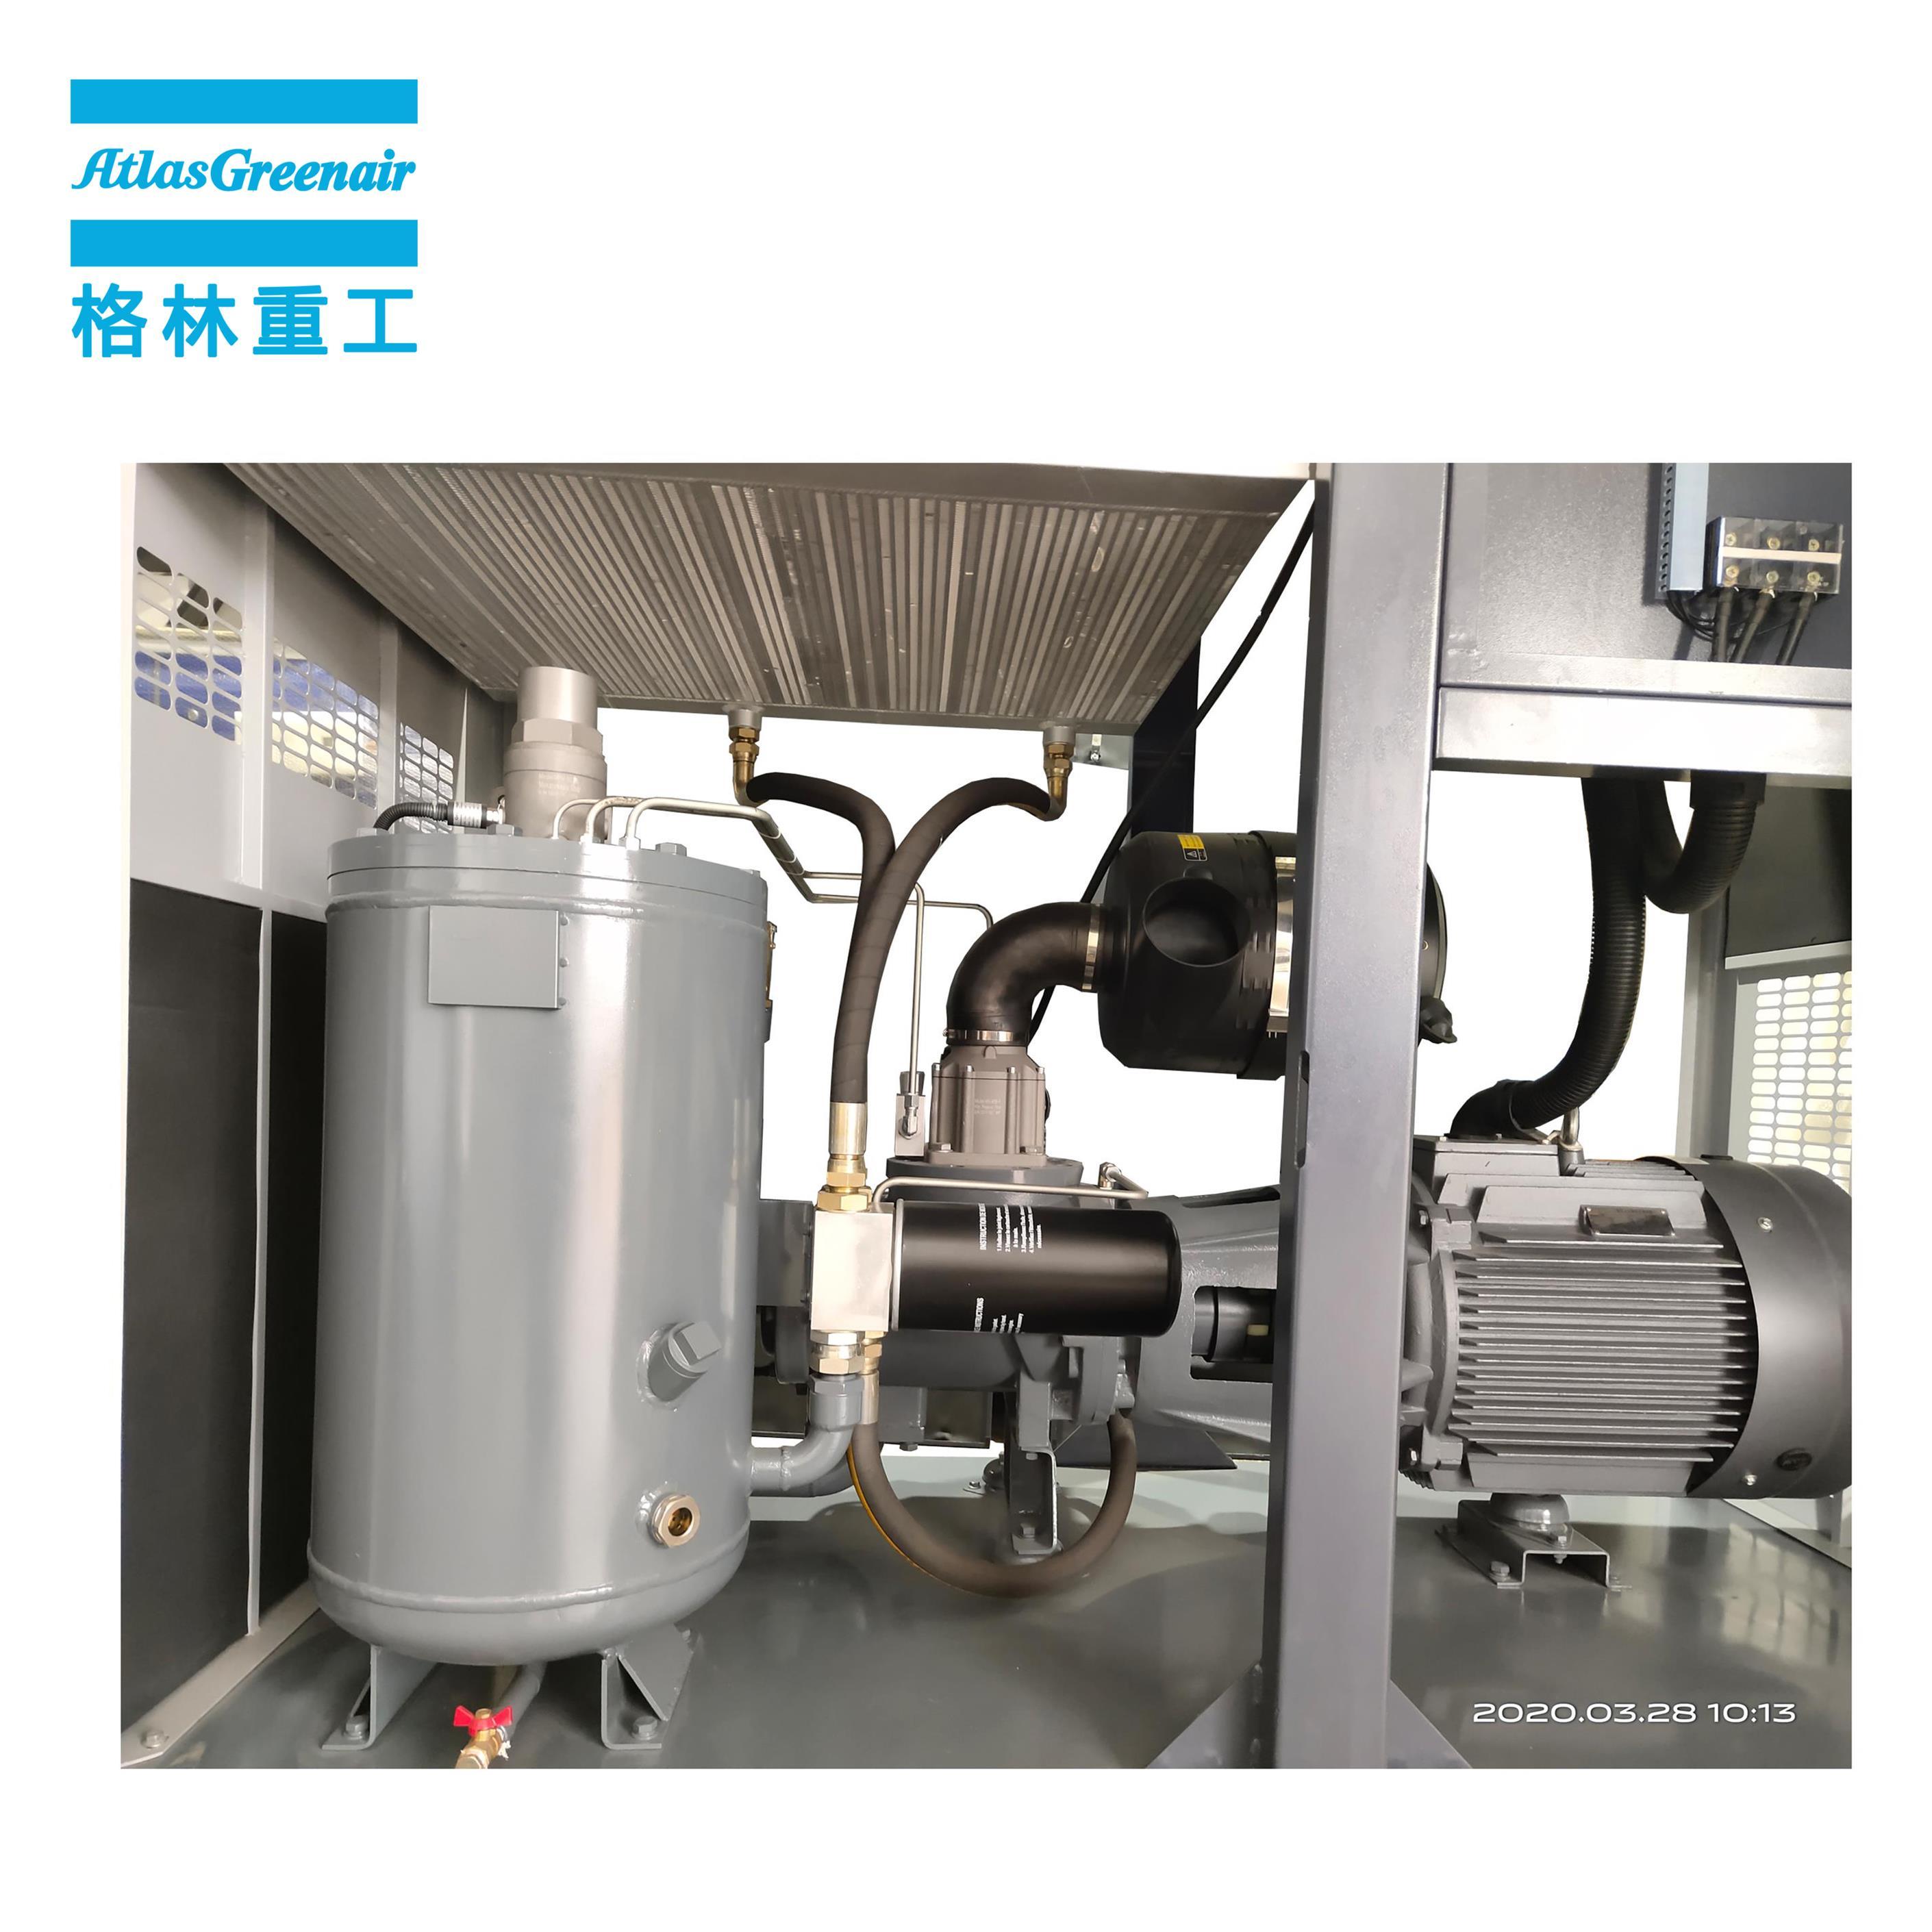 Atlas Greenair Screw Air Compressor customized variable speed air compressor manufacturer for tropical area-2